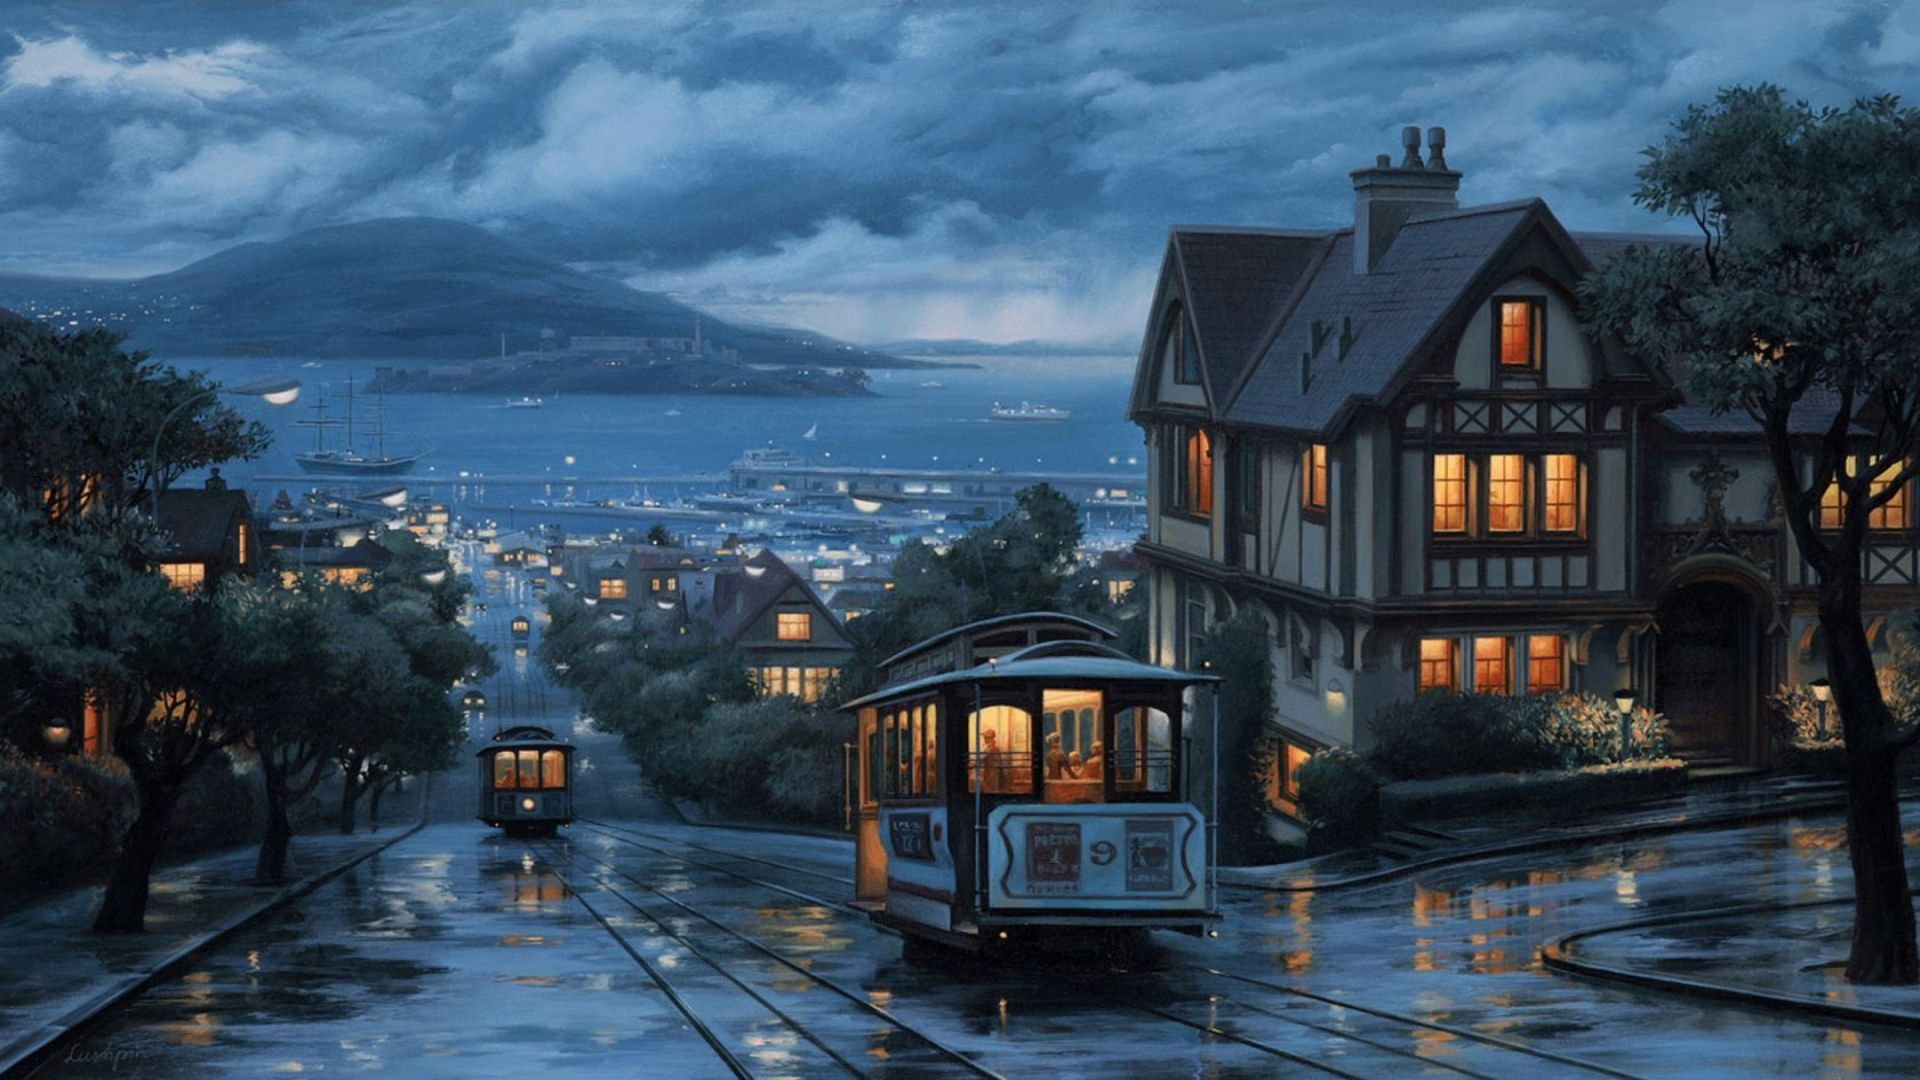 The Urban Landscape